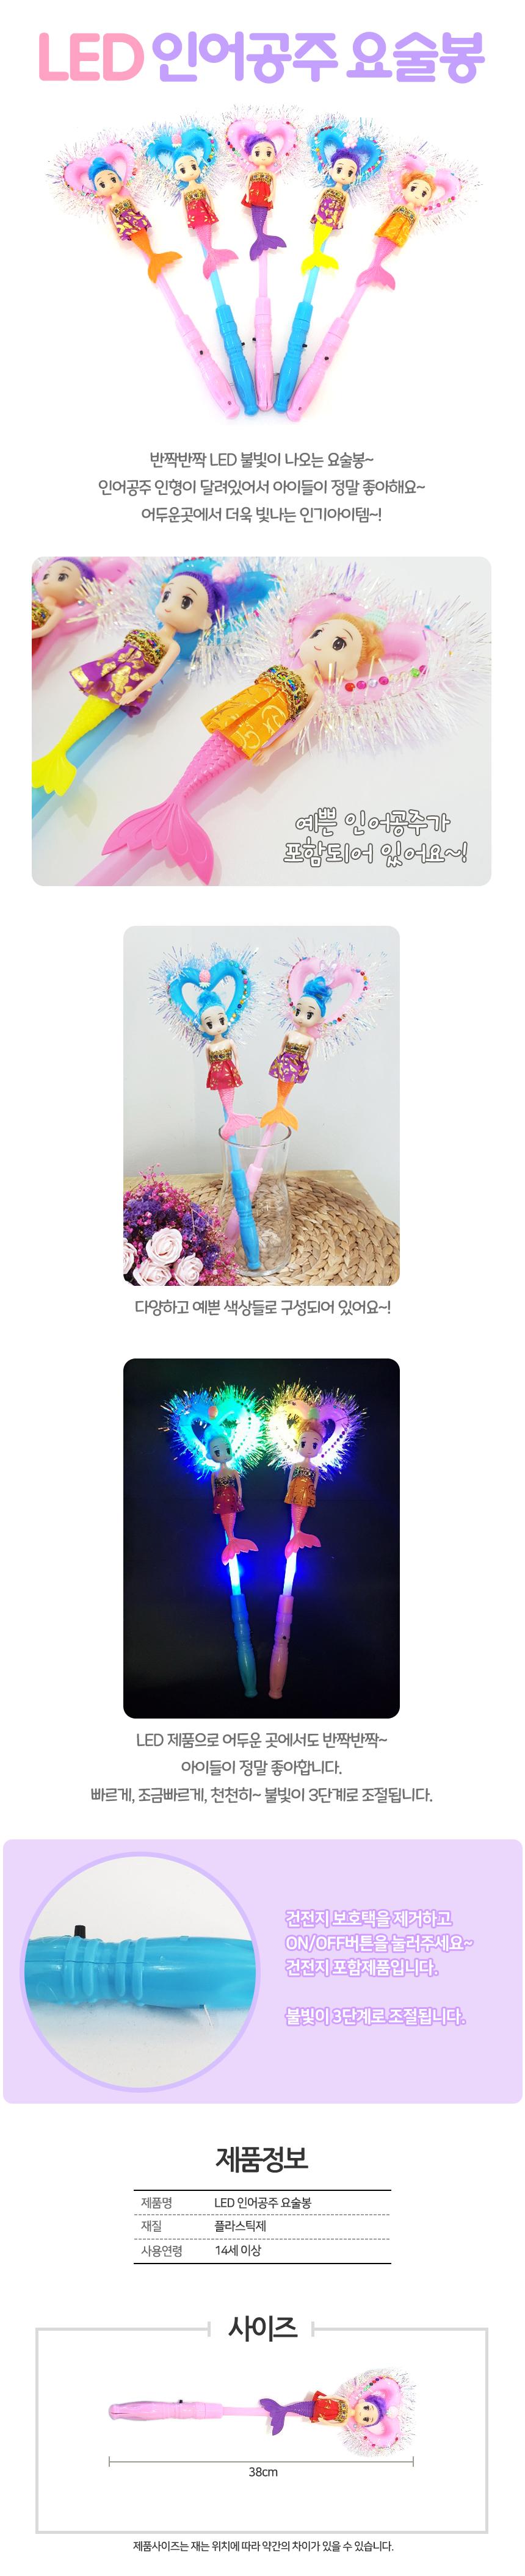 prince_bong.jpg